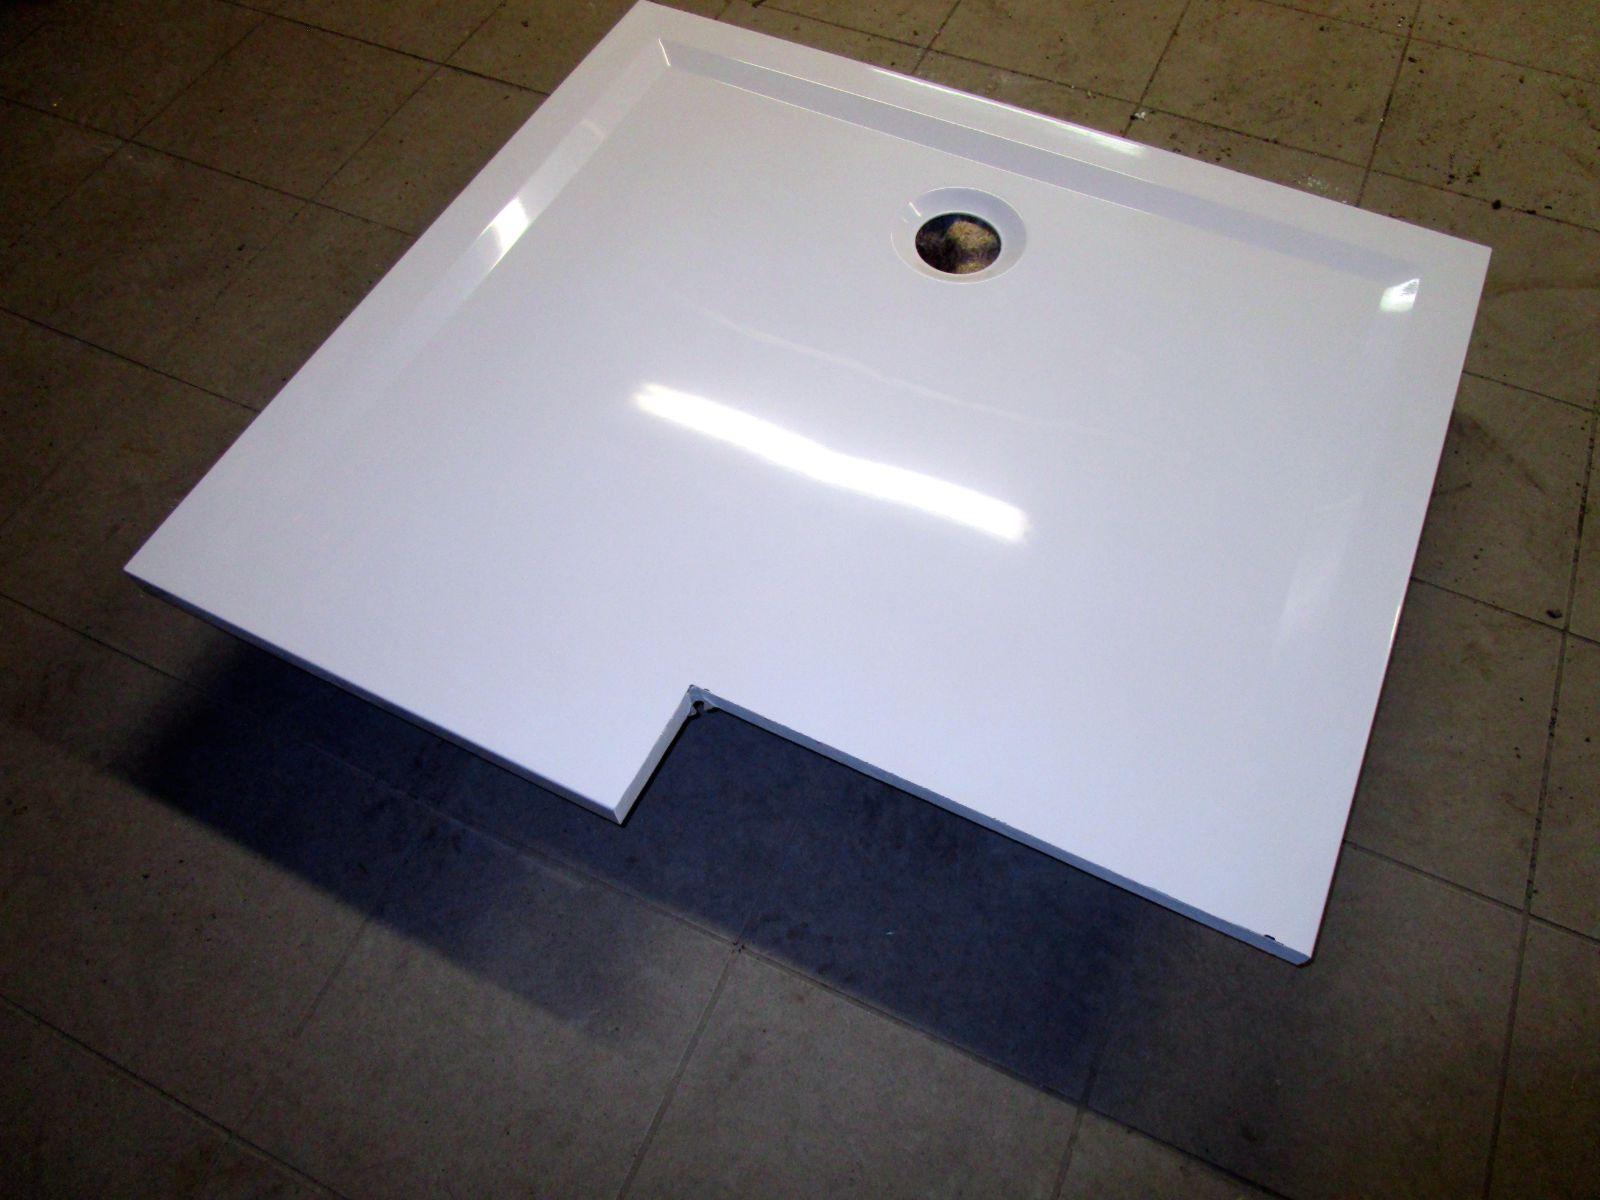 hoesch duschwanne in nische einpassen bernd block haustechnik. Black Bedroom Furniture Sets. Home Design Ideas